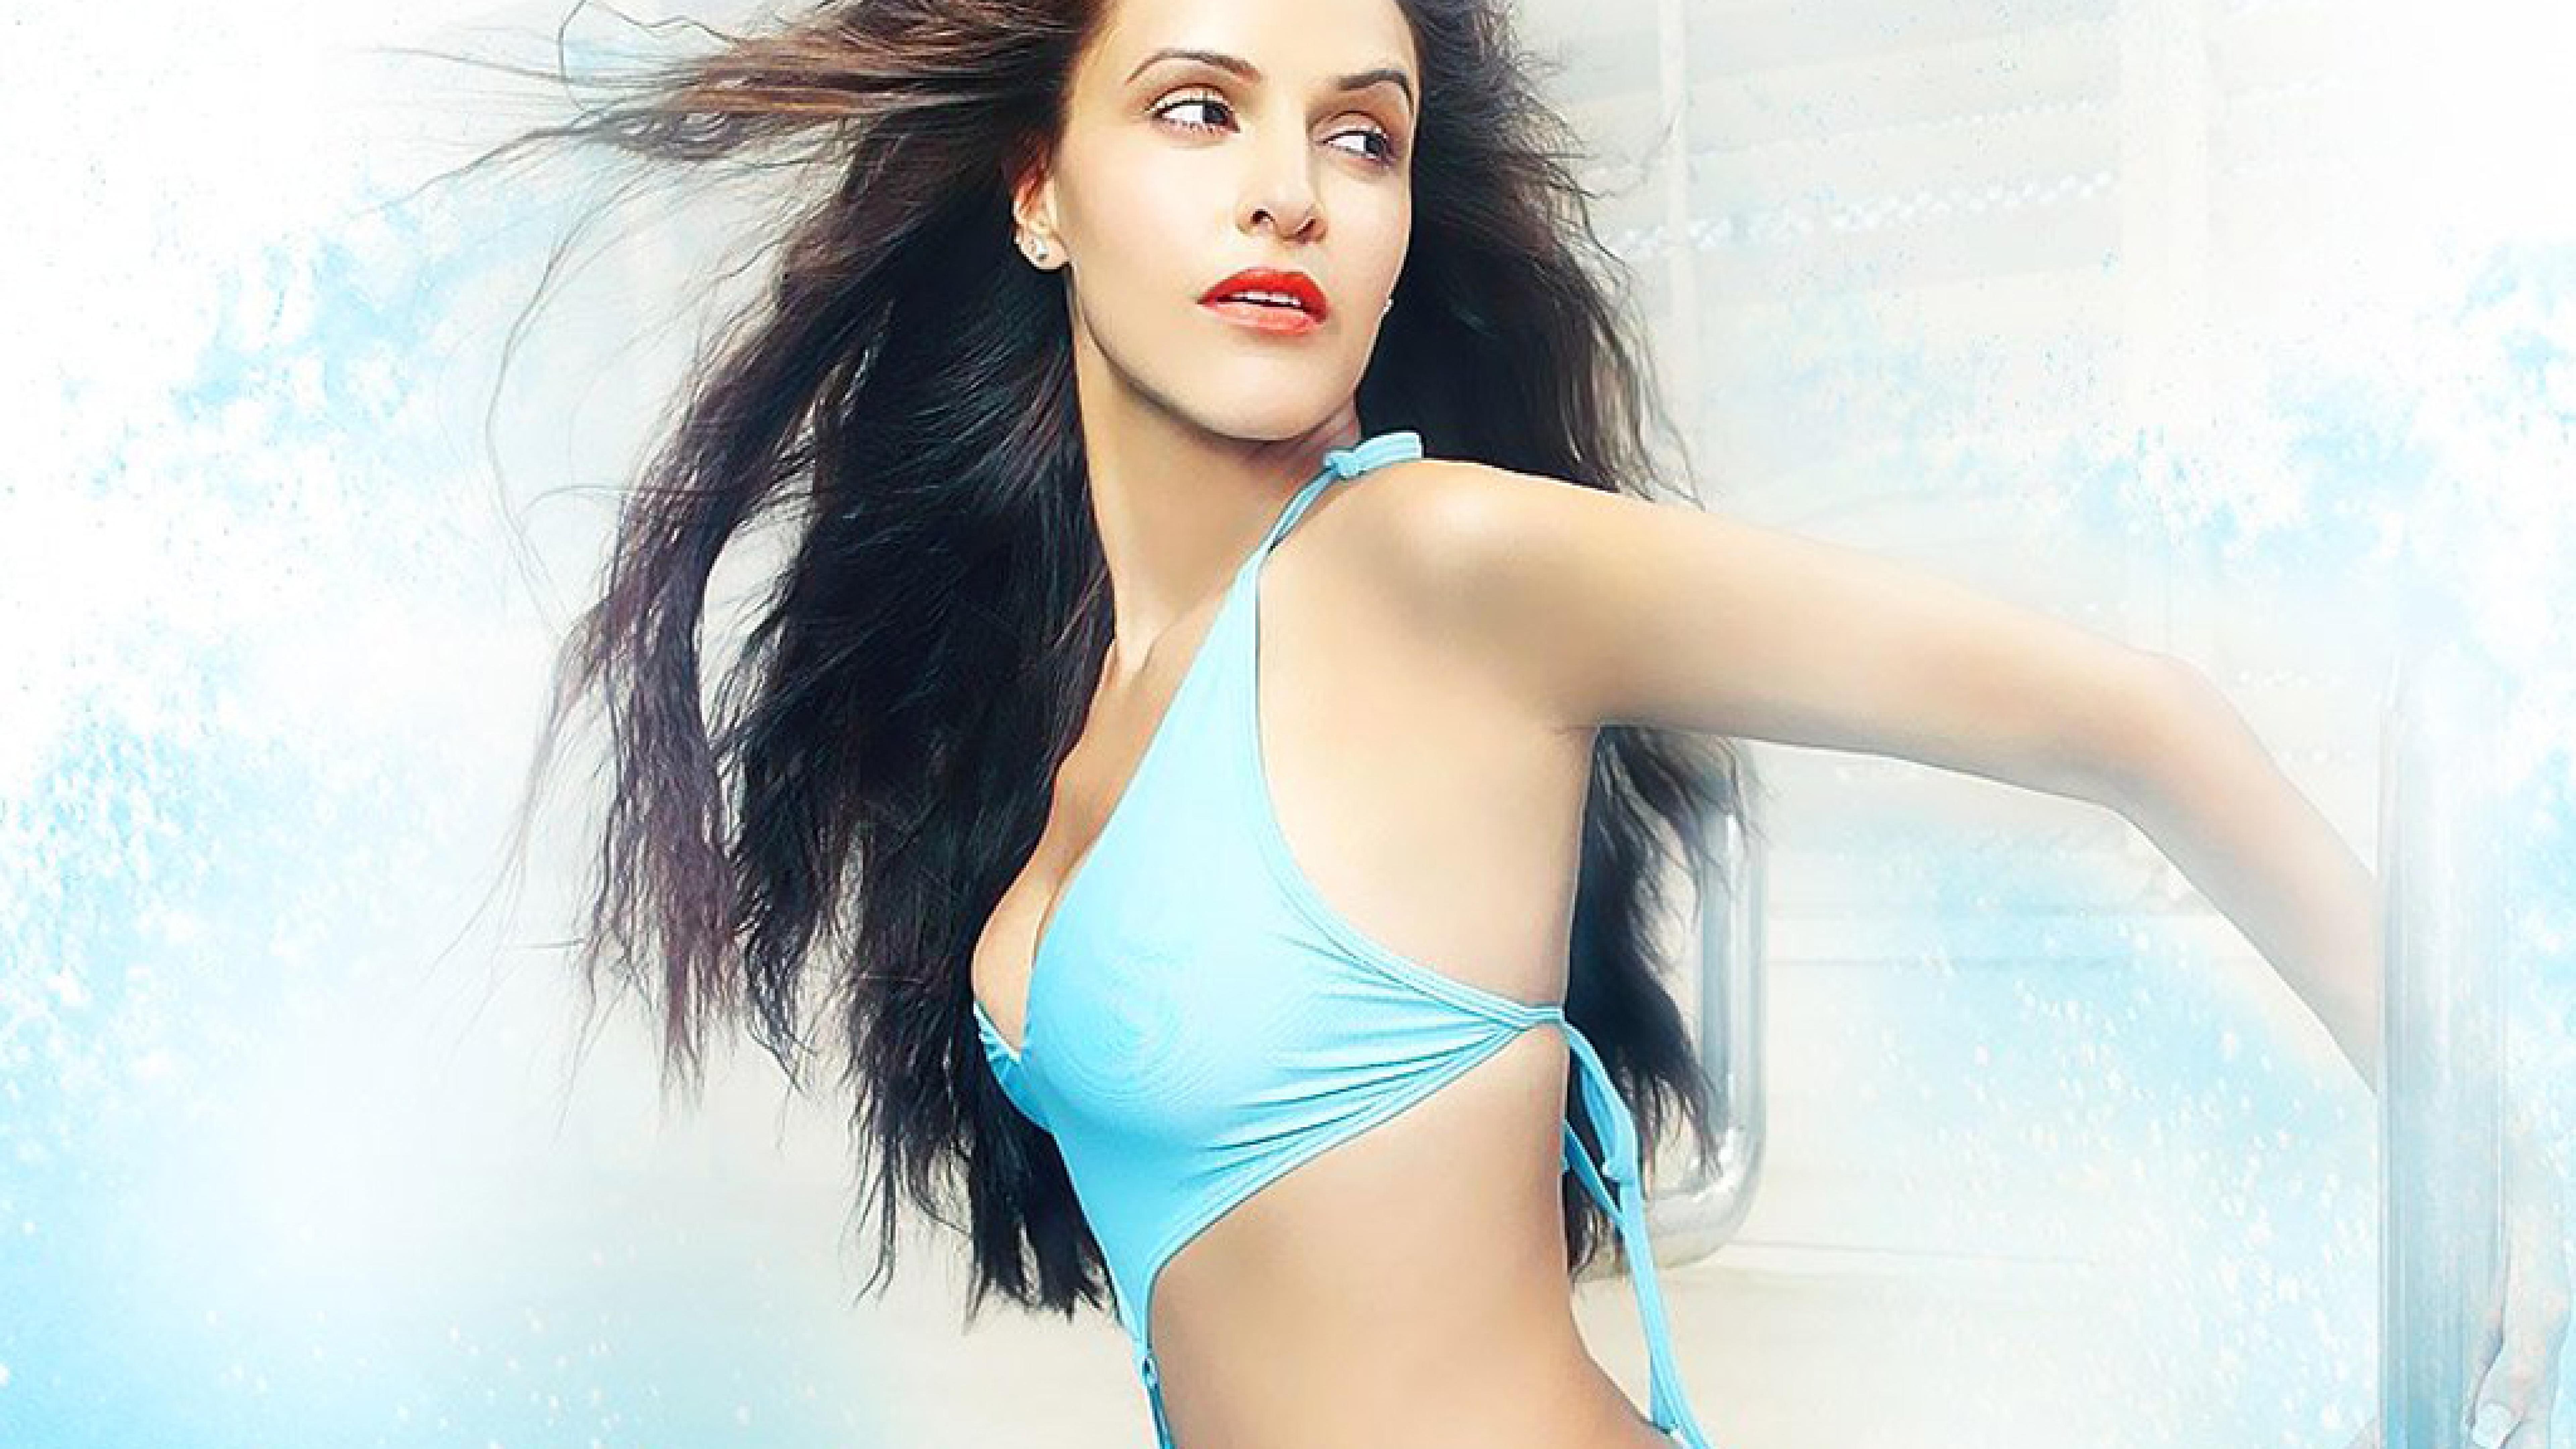 Neha Dhupia New Fabulous Bikini Photoshoot, HD Wallpaper